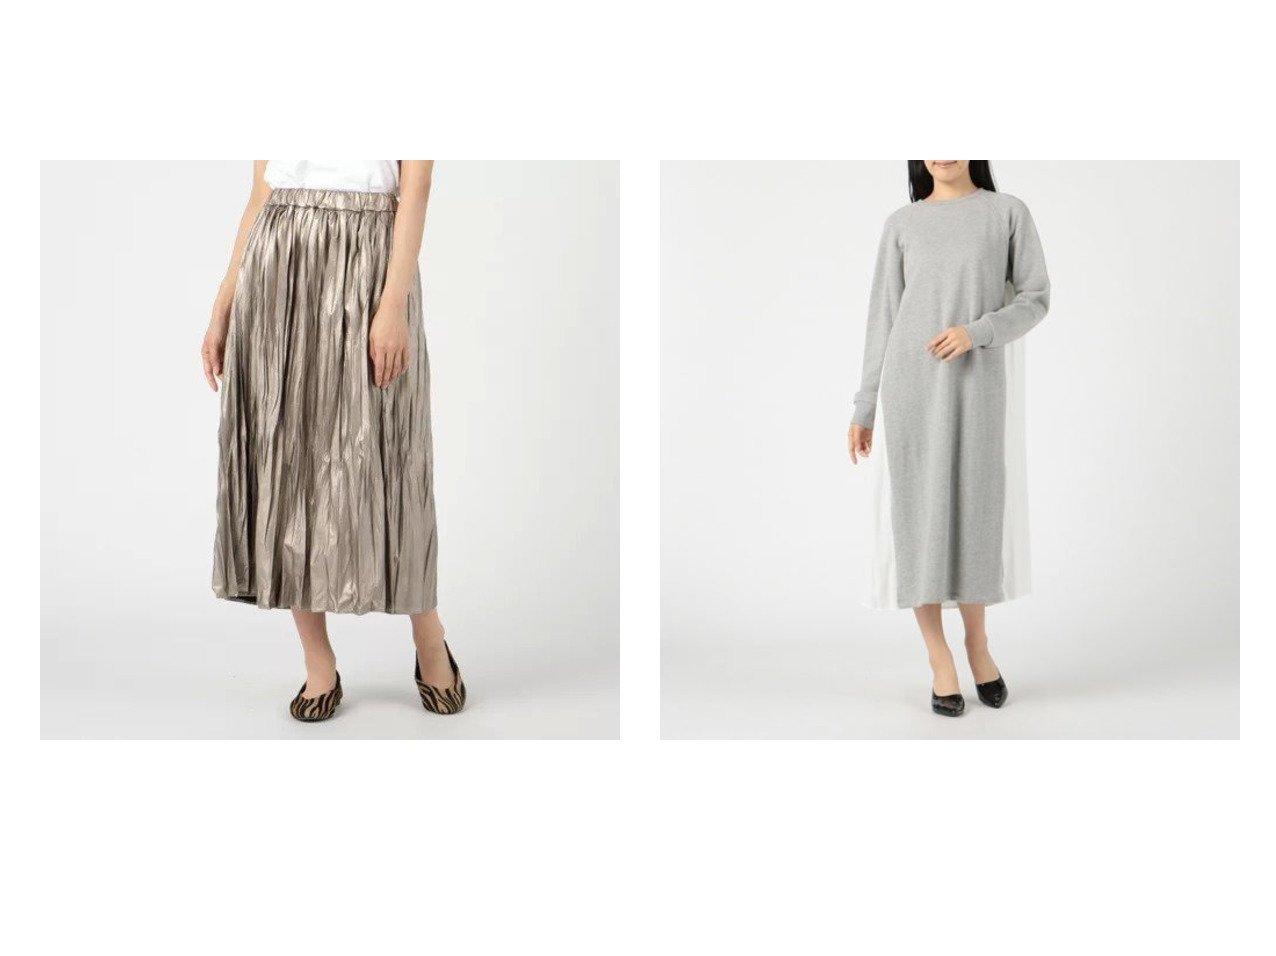 【Munich/ミューニック】のfrench terry x wrinkle satin docking ワンピース&wrinkle light leather gathered skirt おすすめ!人気、トレンド・レディースファッションの通販 おすすめで人気の流行・トレンド、ファッションの通販商品 インテリア・家具・メンズファッション・キッズファッション・レディースファッション・服の通販 founy(ファニー) https://founy.com/ ファッション Fashion レディースファッション WOMEN スカート Skirt ワンピース Dress ニットワンピース Knit Dresses エレガント ギャザー マキシ ロング サテン ドッキング フロント ミックス 洗える 長袖 |ID:crp329100000072373